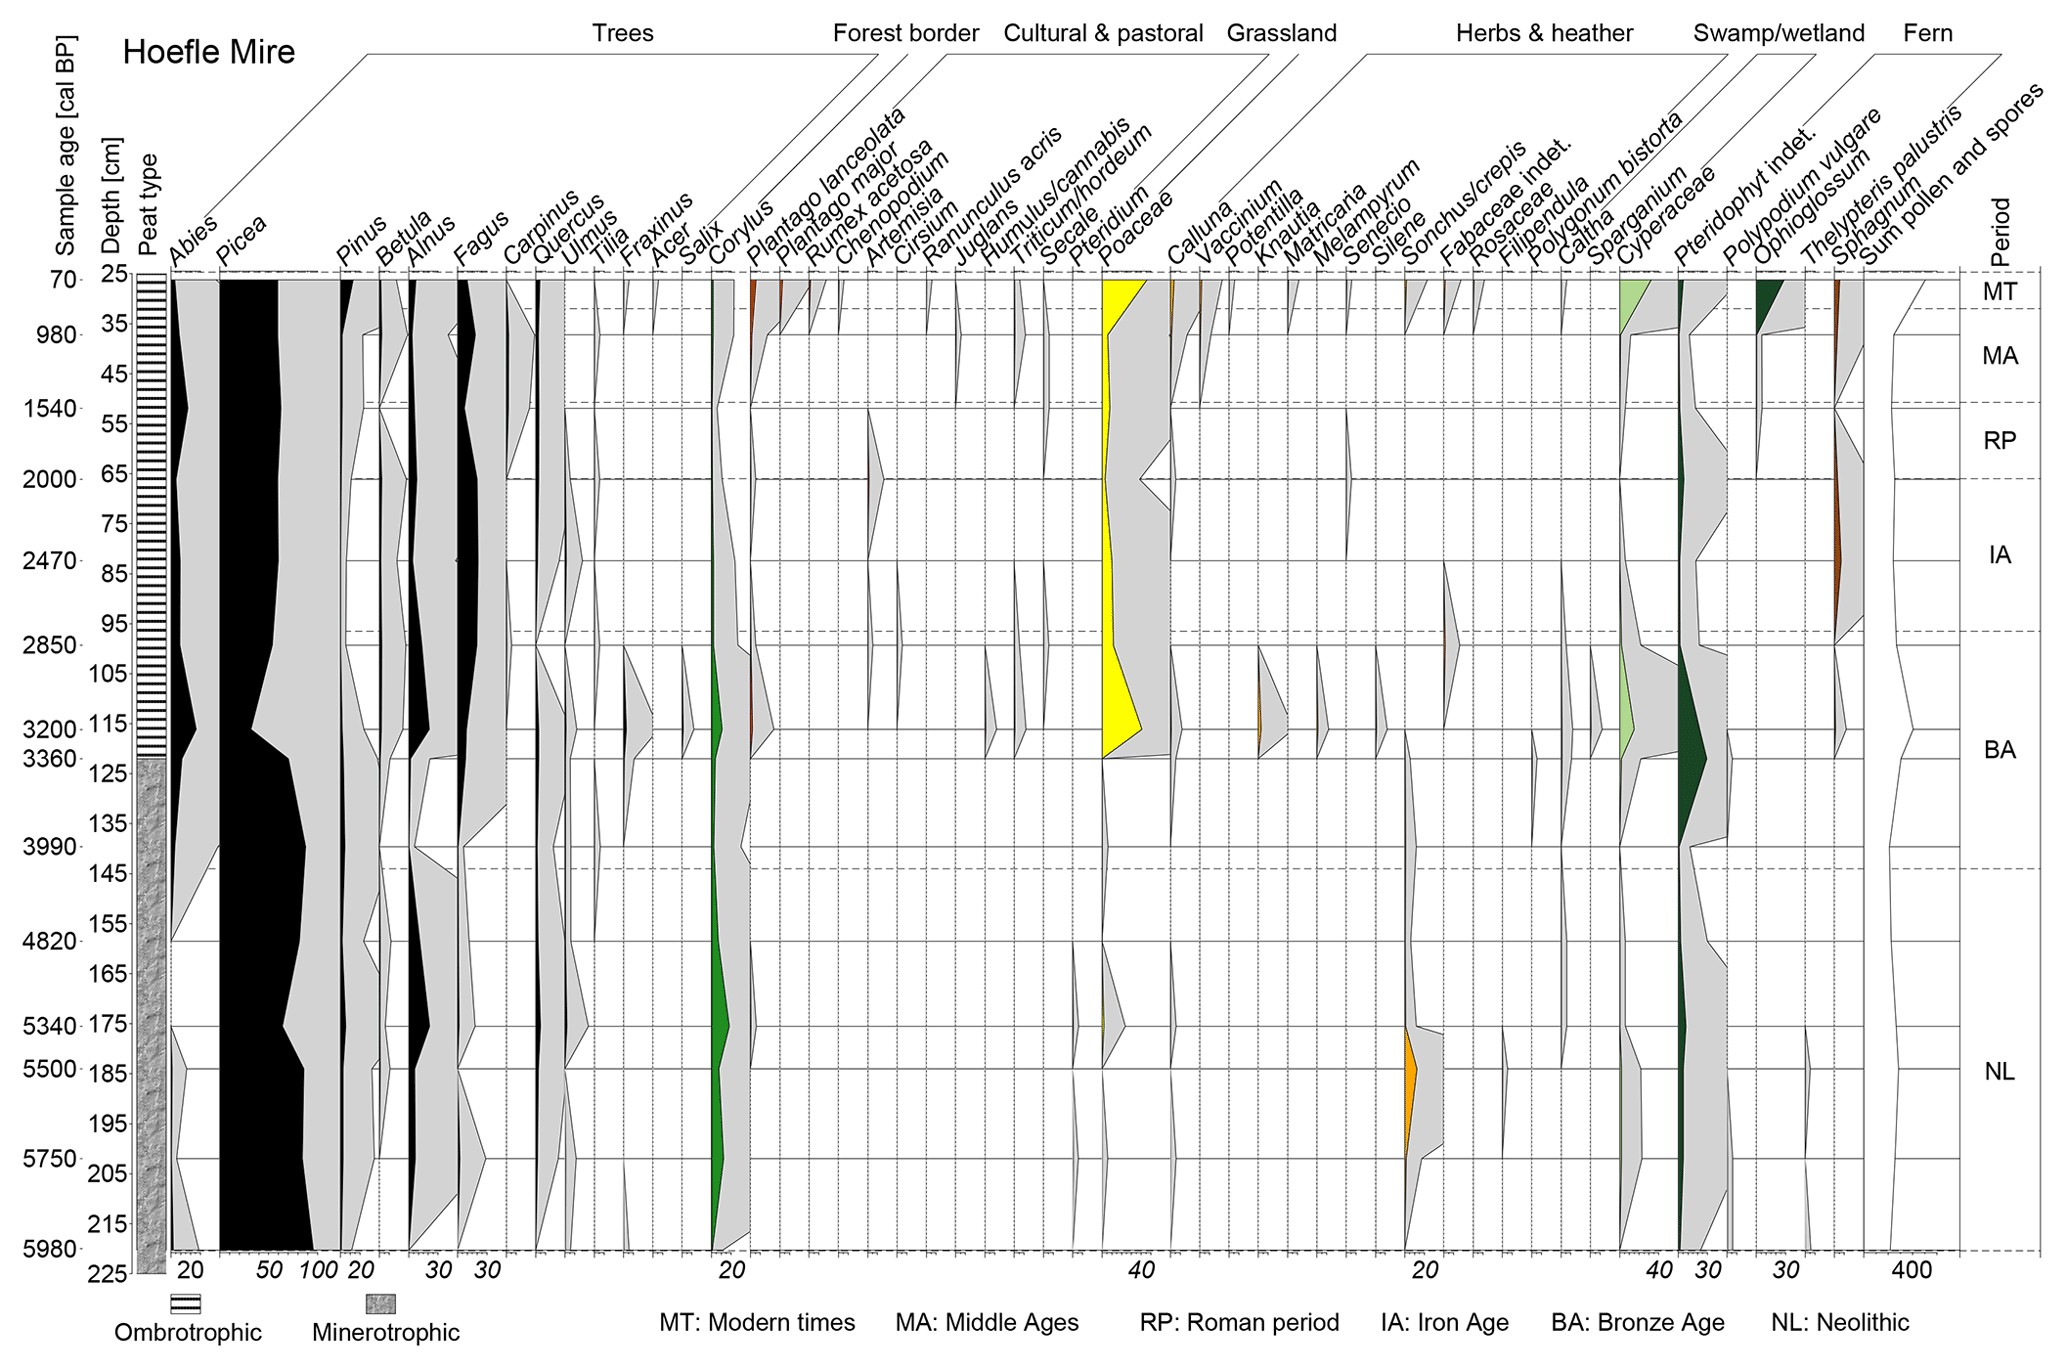 EGQSJ - 6200 years of human activities and environmental change in